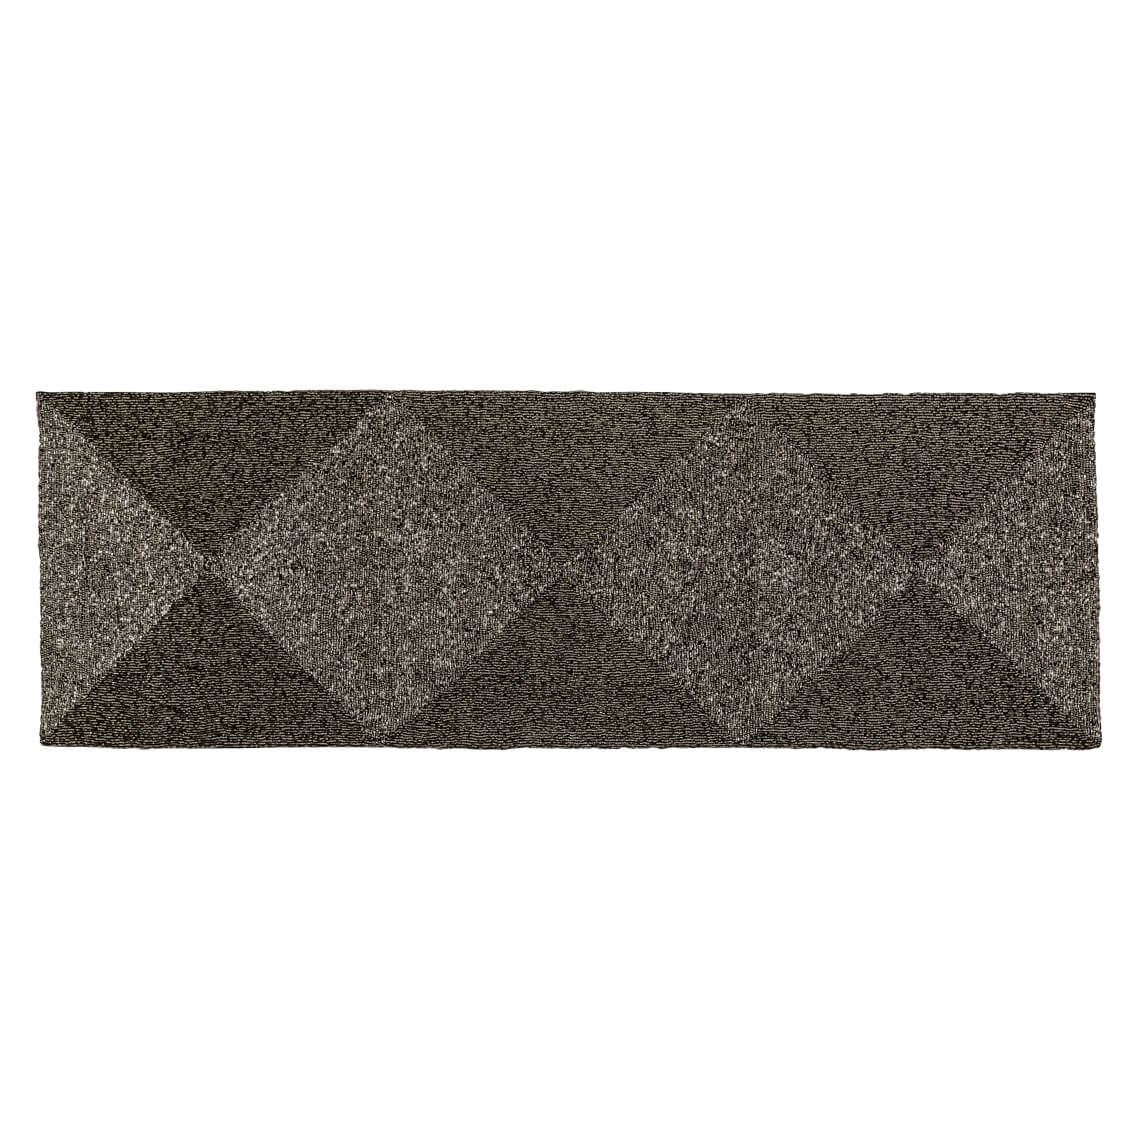 Auden Table Runner, Grey / Metallic Size W 35cm x D 105cm x H 1cm in Grey/Metallic Freedom